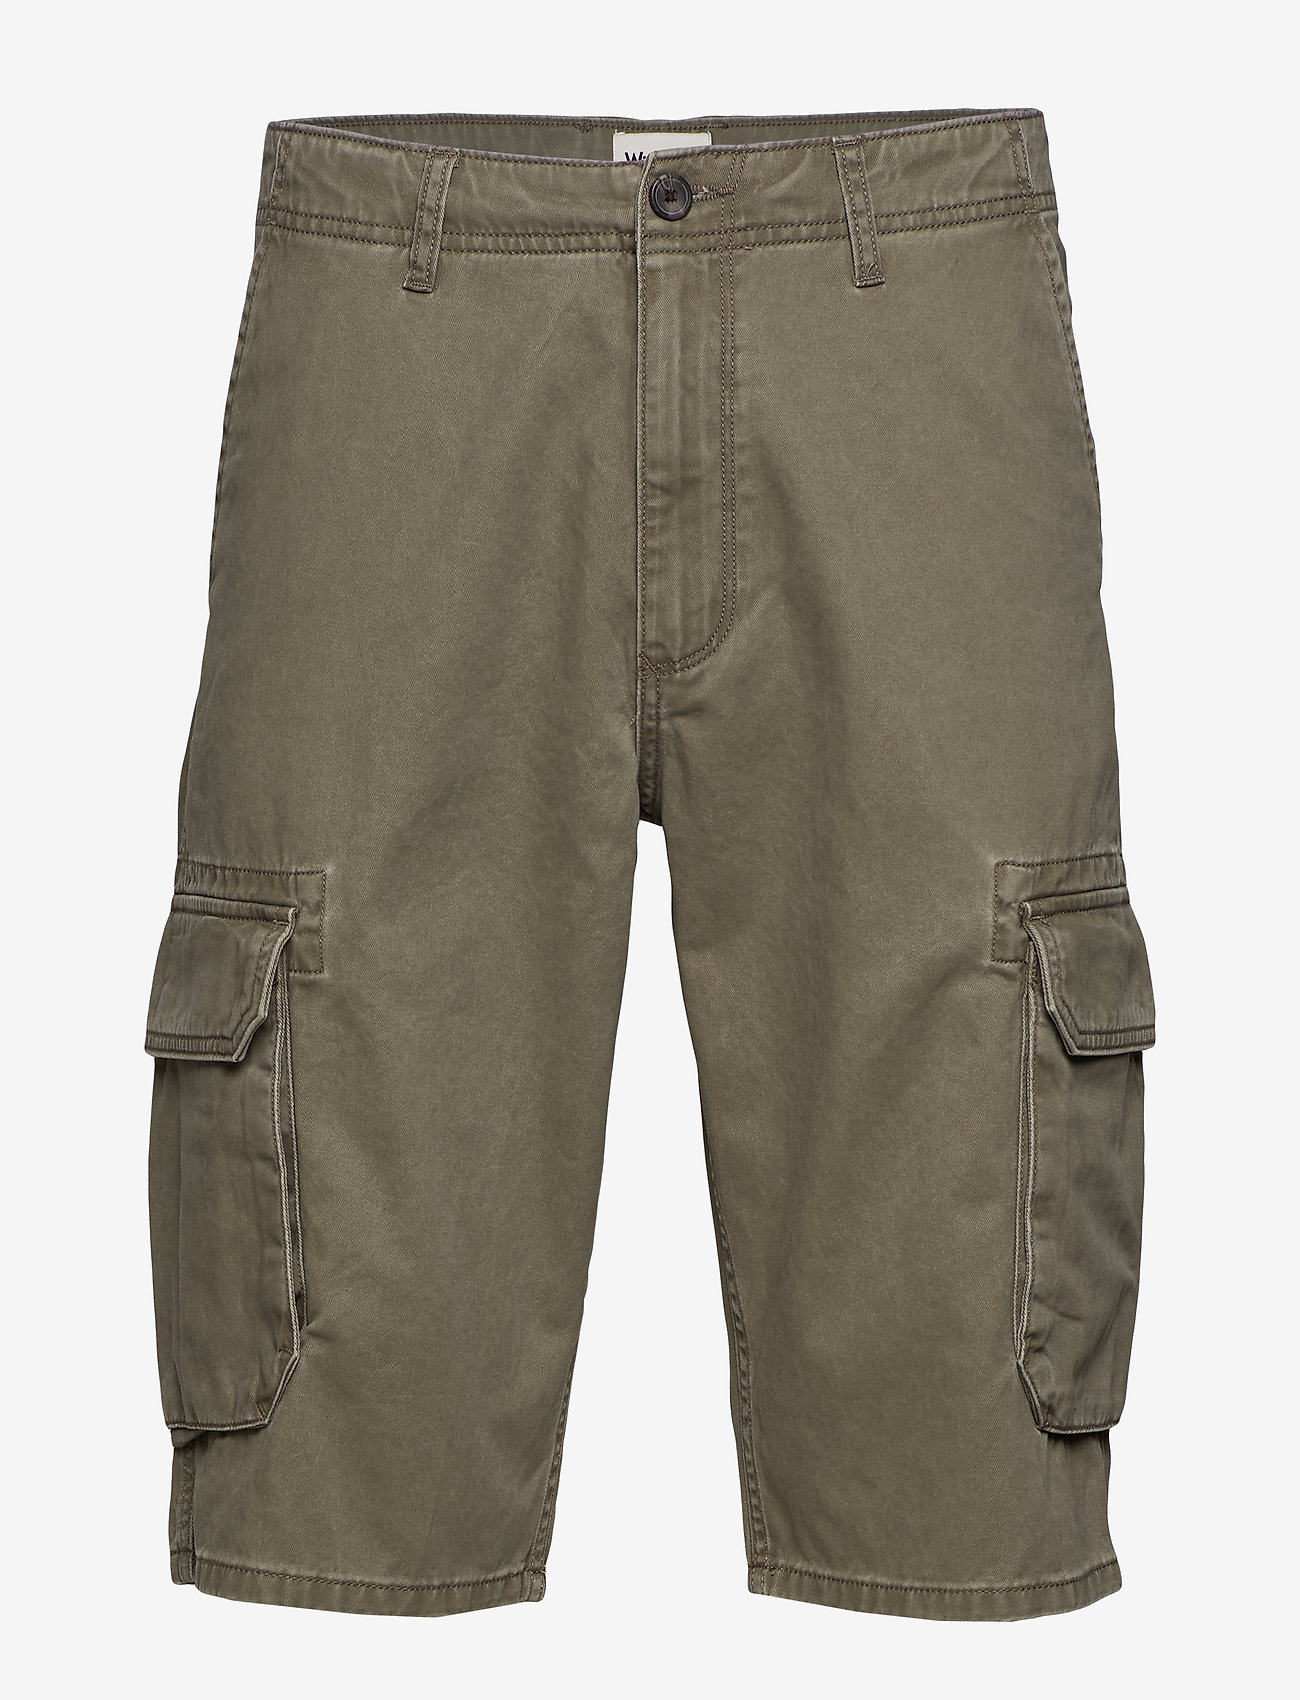 Wrangler - CARGO SHORT - casual shorts - dusty olive